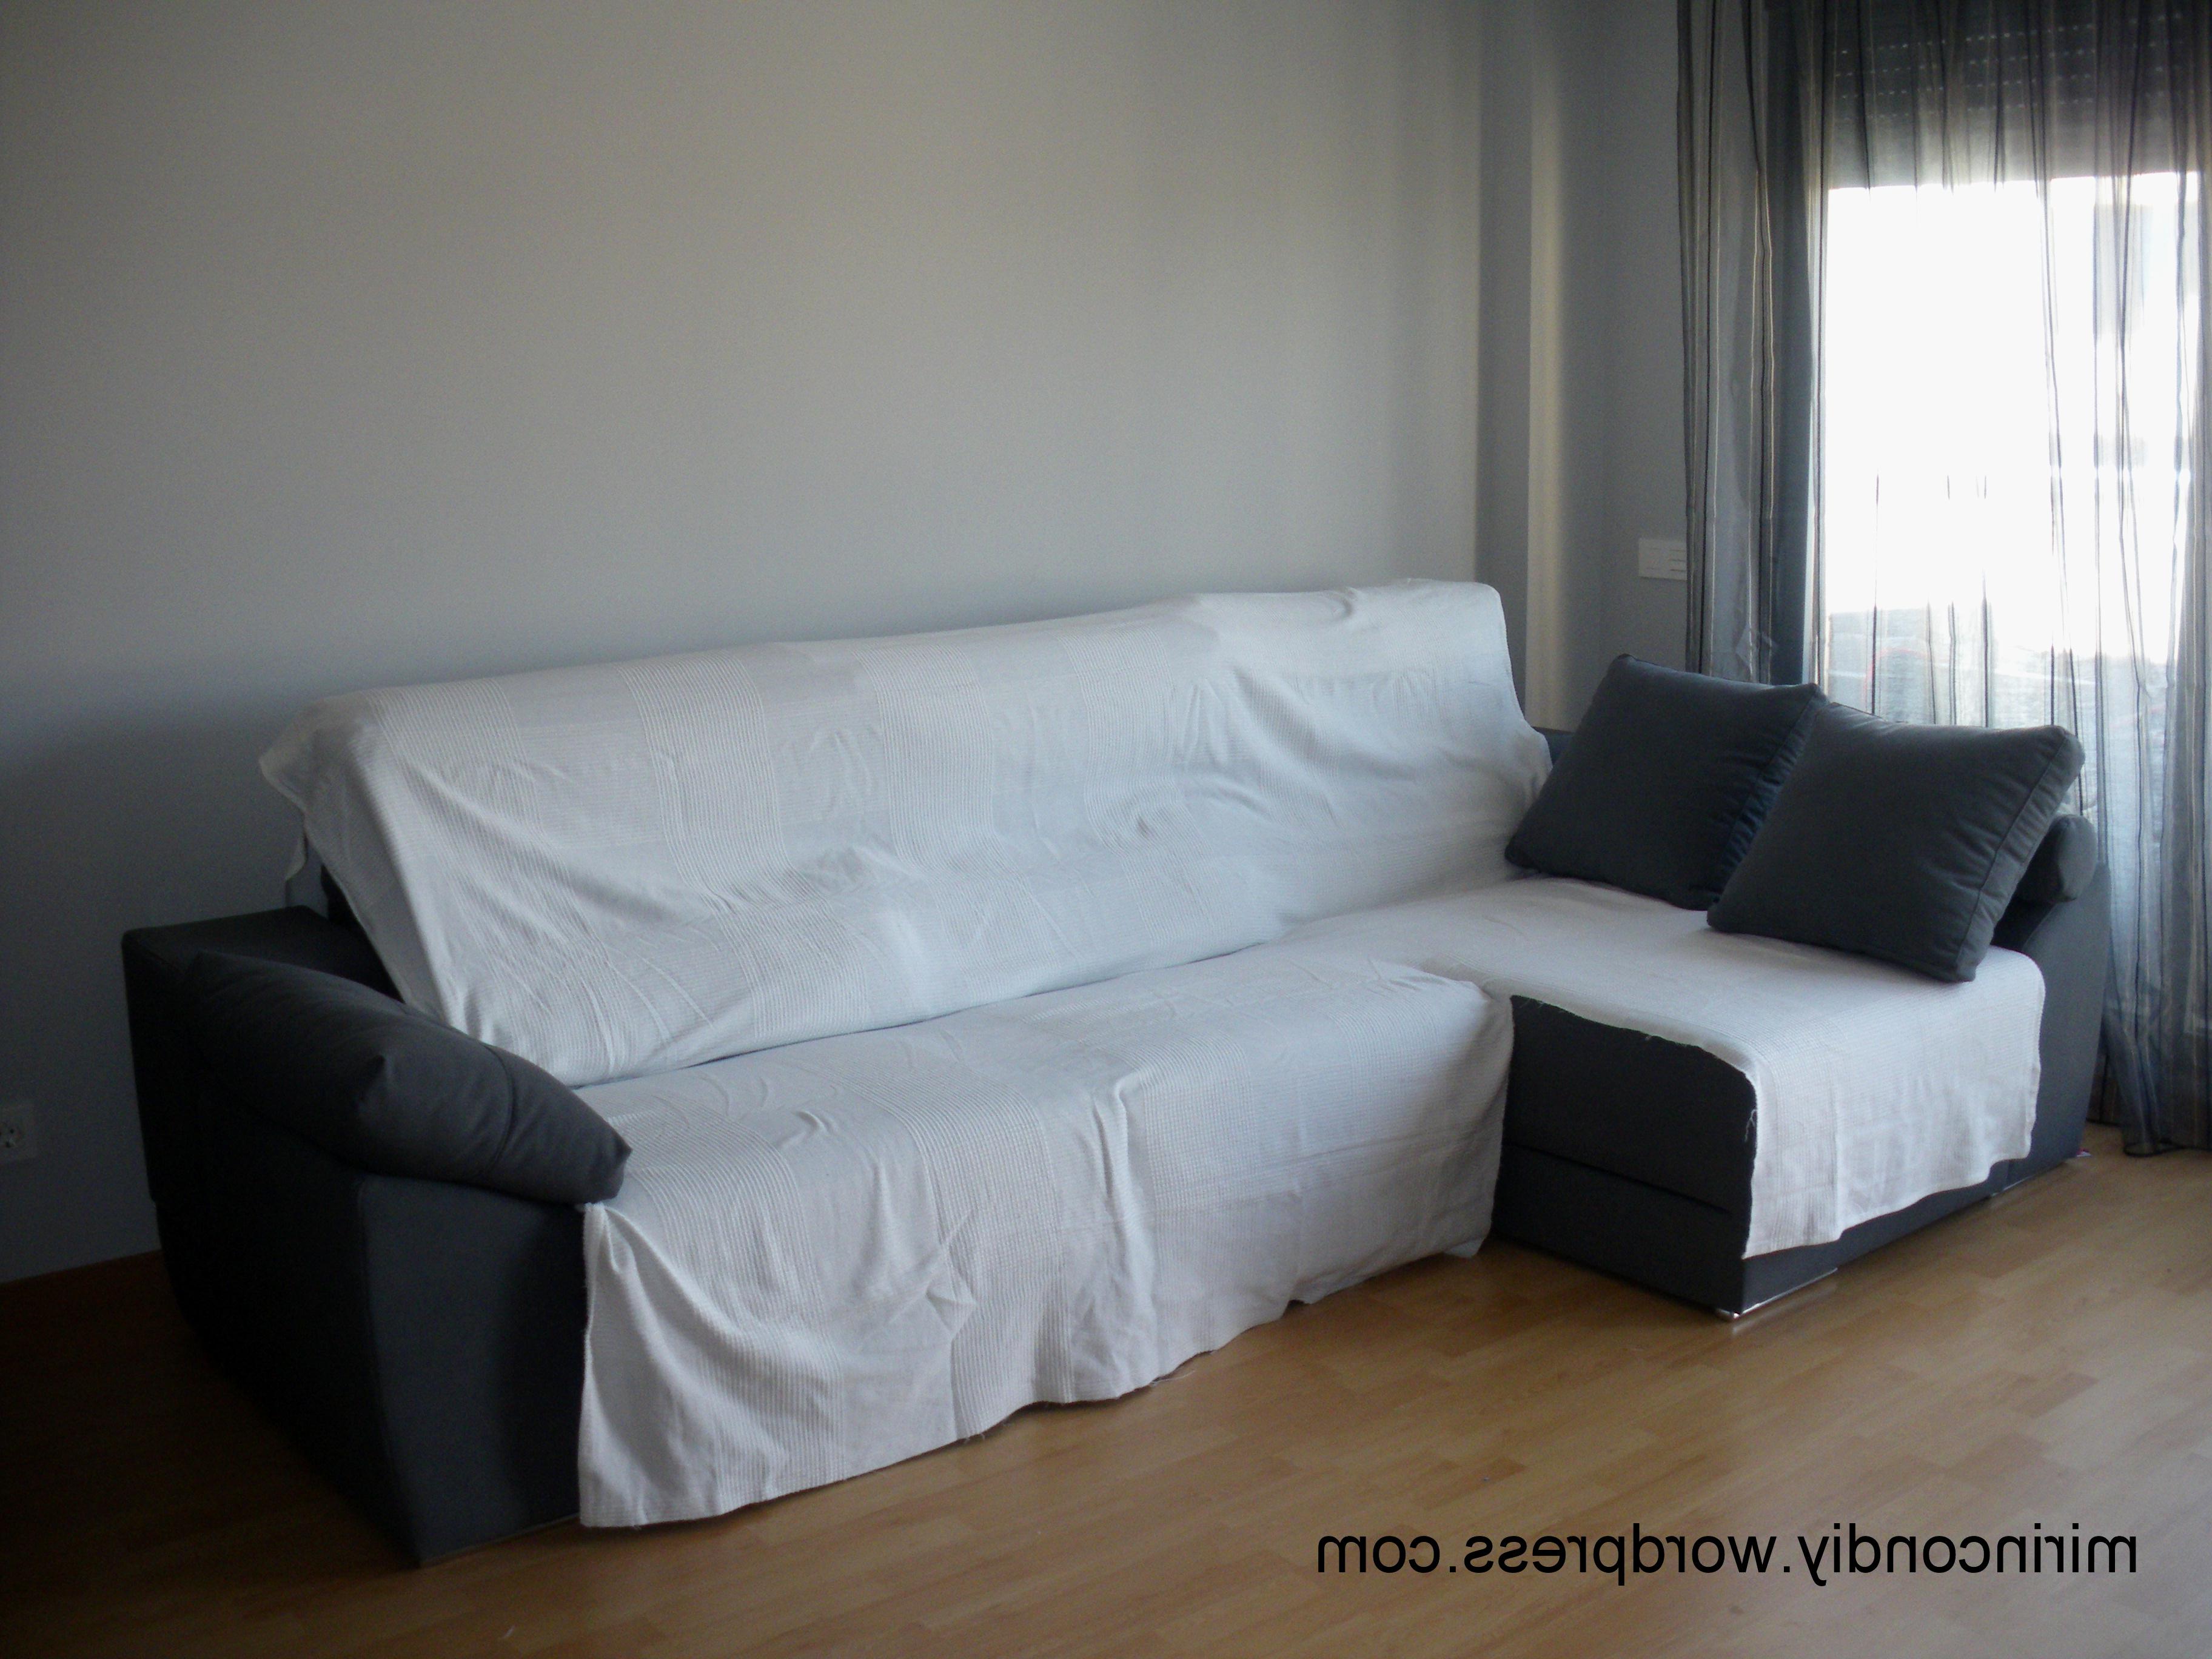 Telas Para Cubrir sofas Ikea Nkde Telas Para Cubrir sofas Ikea Tienda Online De Fundas De sofÃ